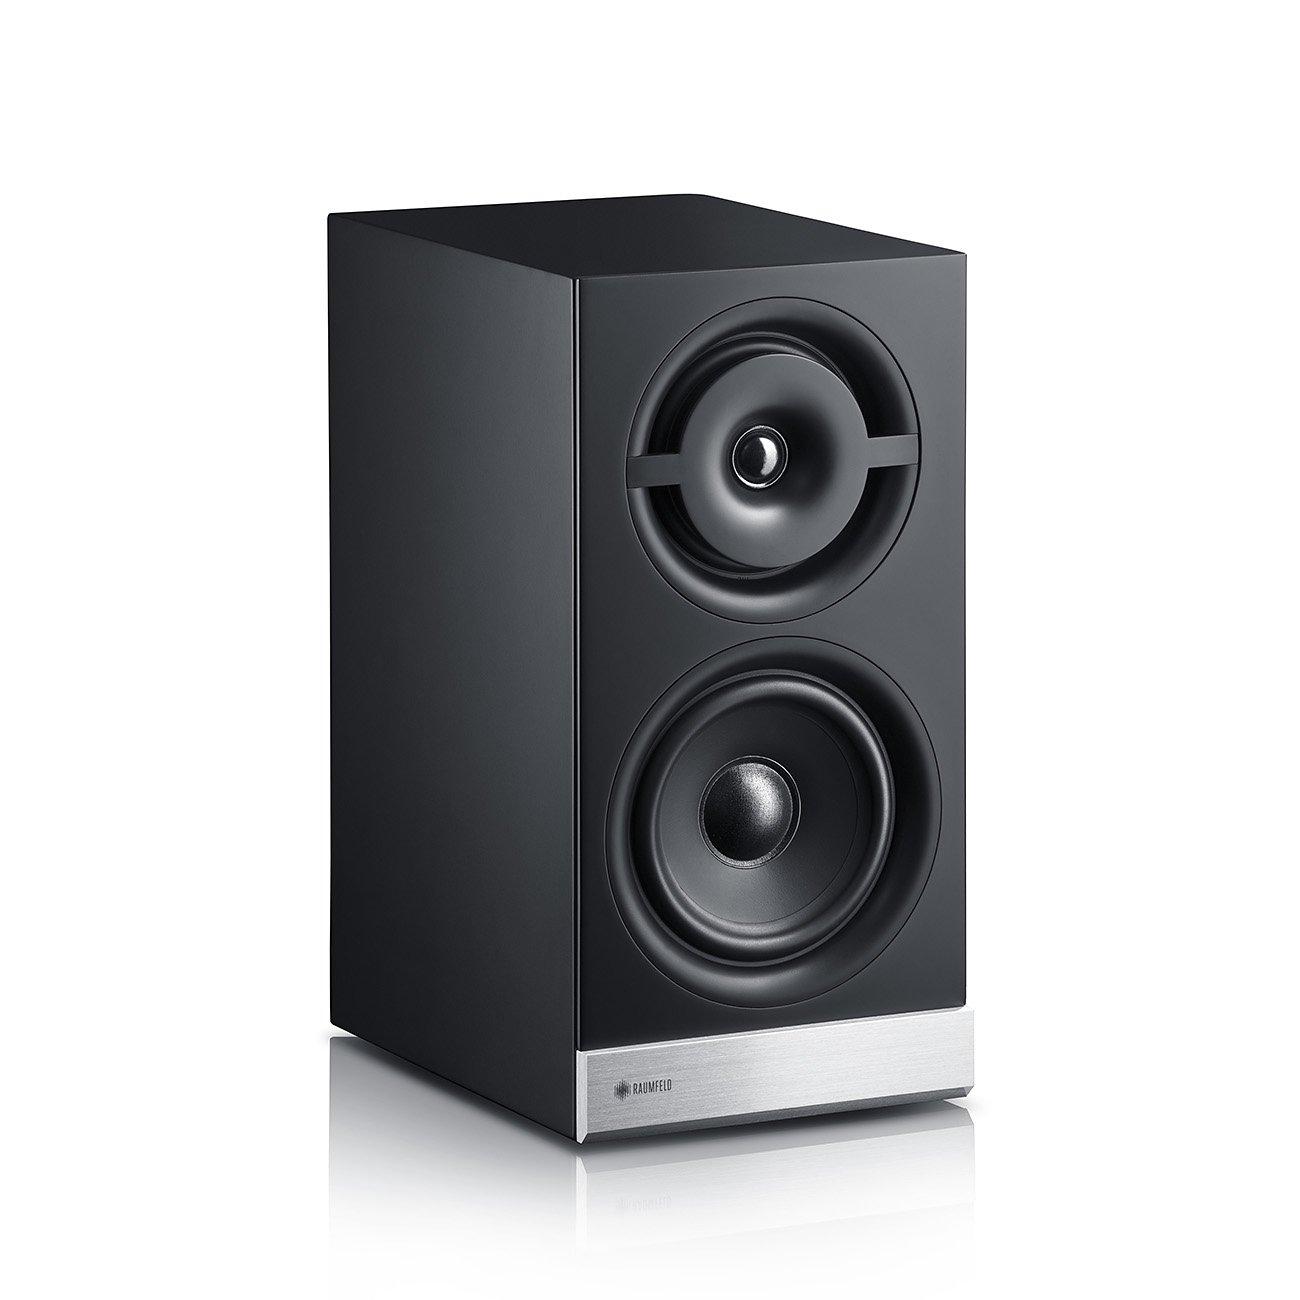 teufel 9213 raumfeld stereo m lautsprecher hifi sound speaker 320 watt slave ebay. Black Bedroom Furniture Sets. Home Design Ideas